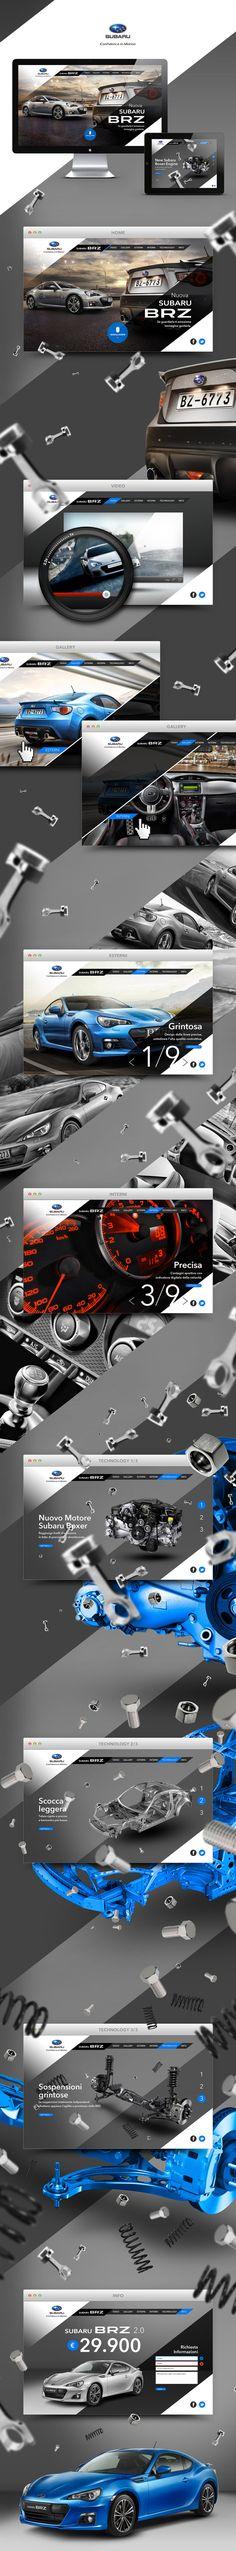 Subaru BRZ Website / Fabio Minerva